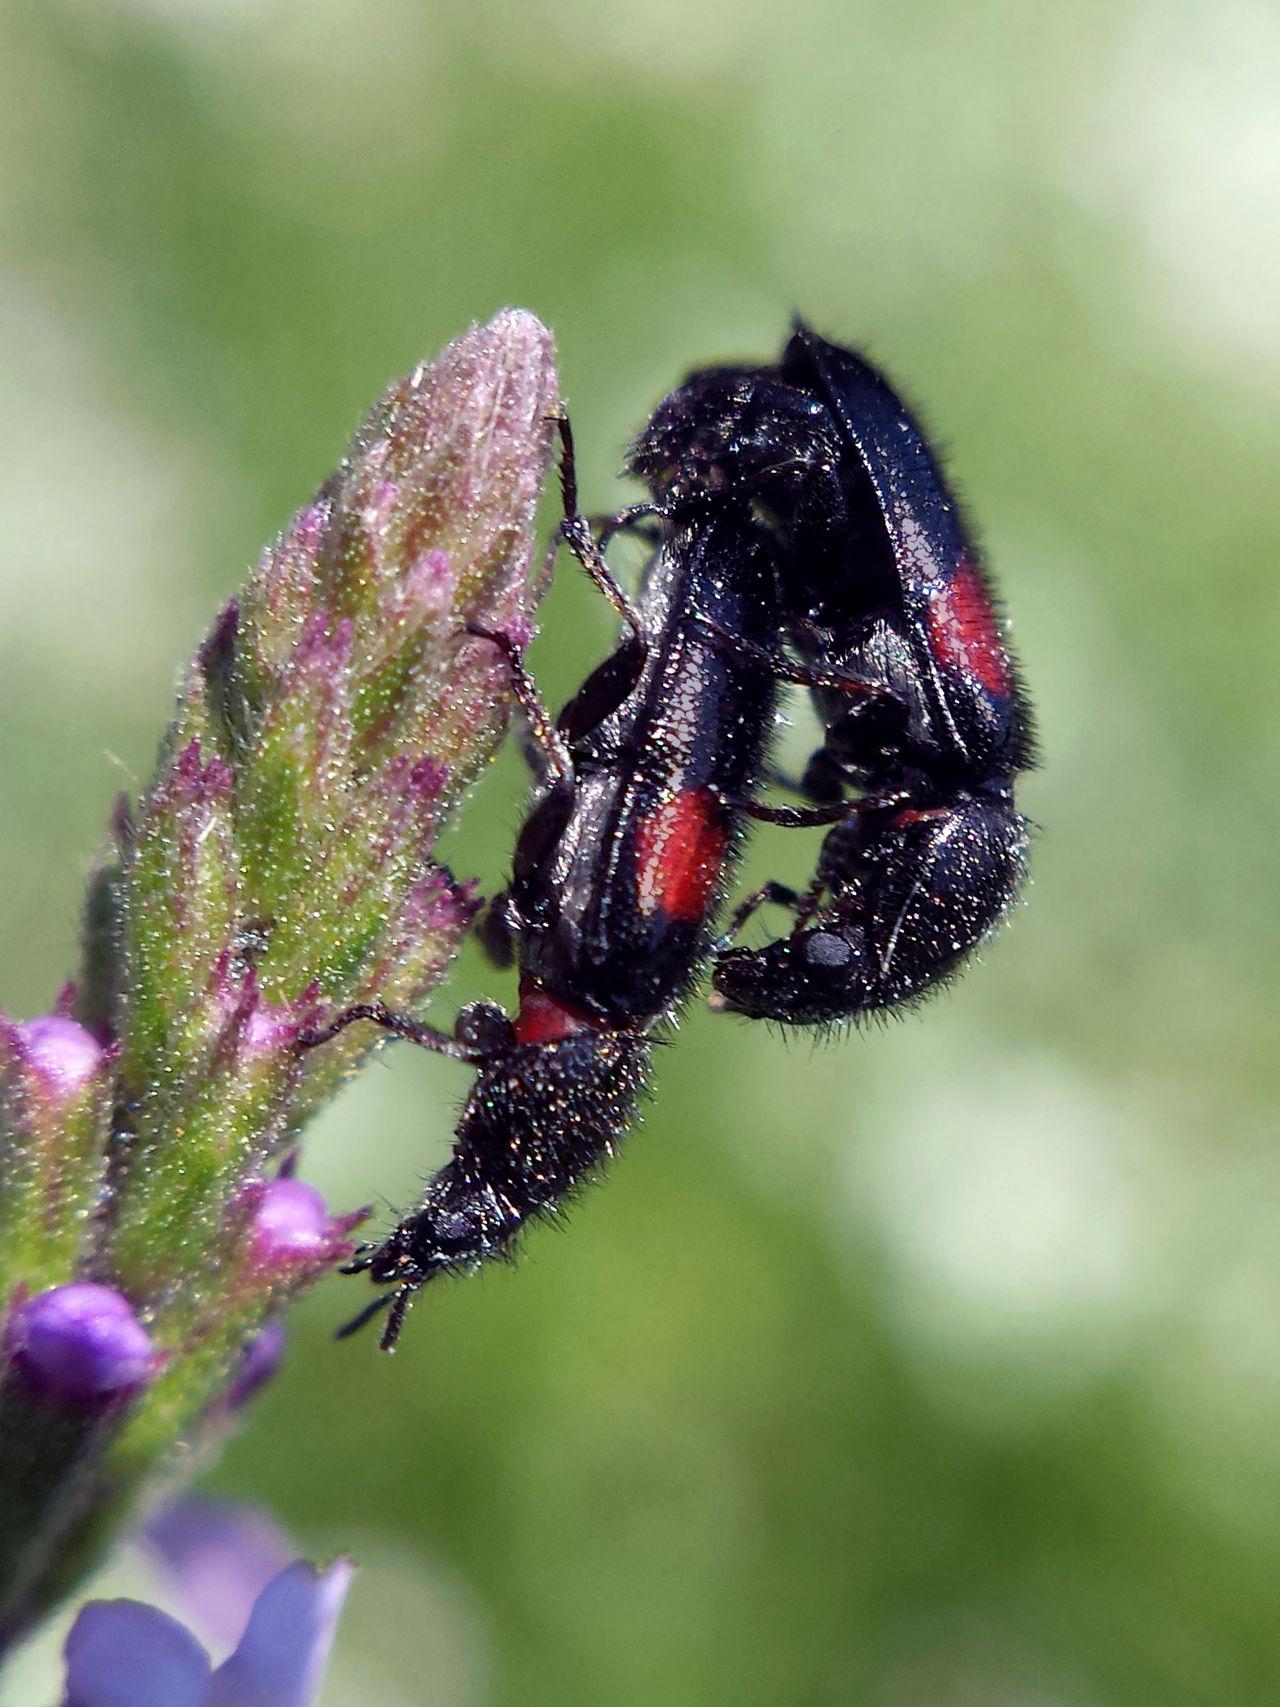 Divales Bipustulatus copulation - Serchio River Arthropoda Beauty In Nature Close-up Copulating Copulation Hexapoda Insect Insecta Macro Nature Outdoors Maximum Closeness